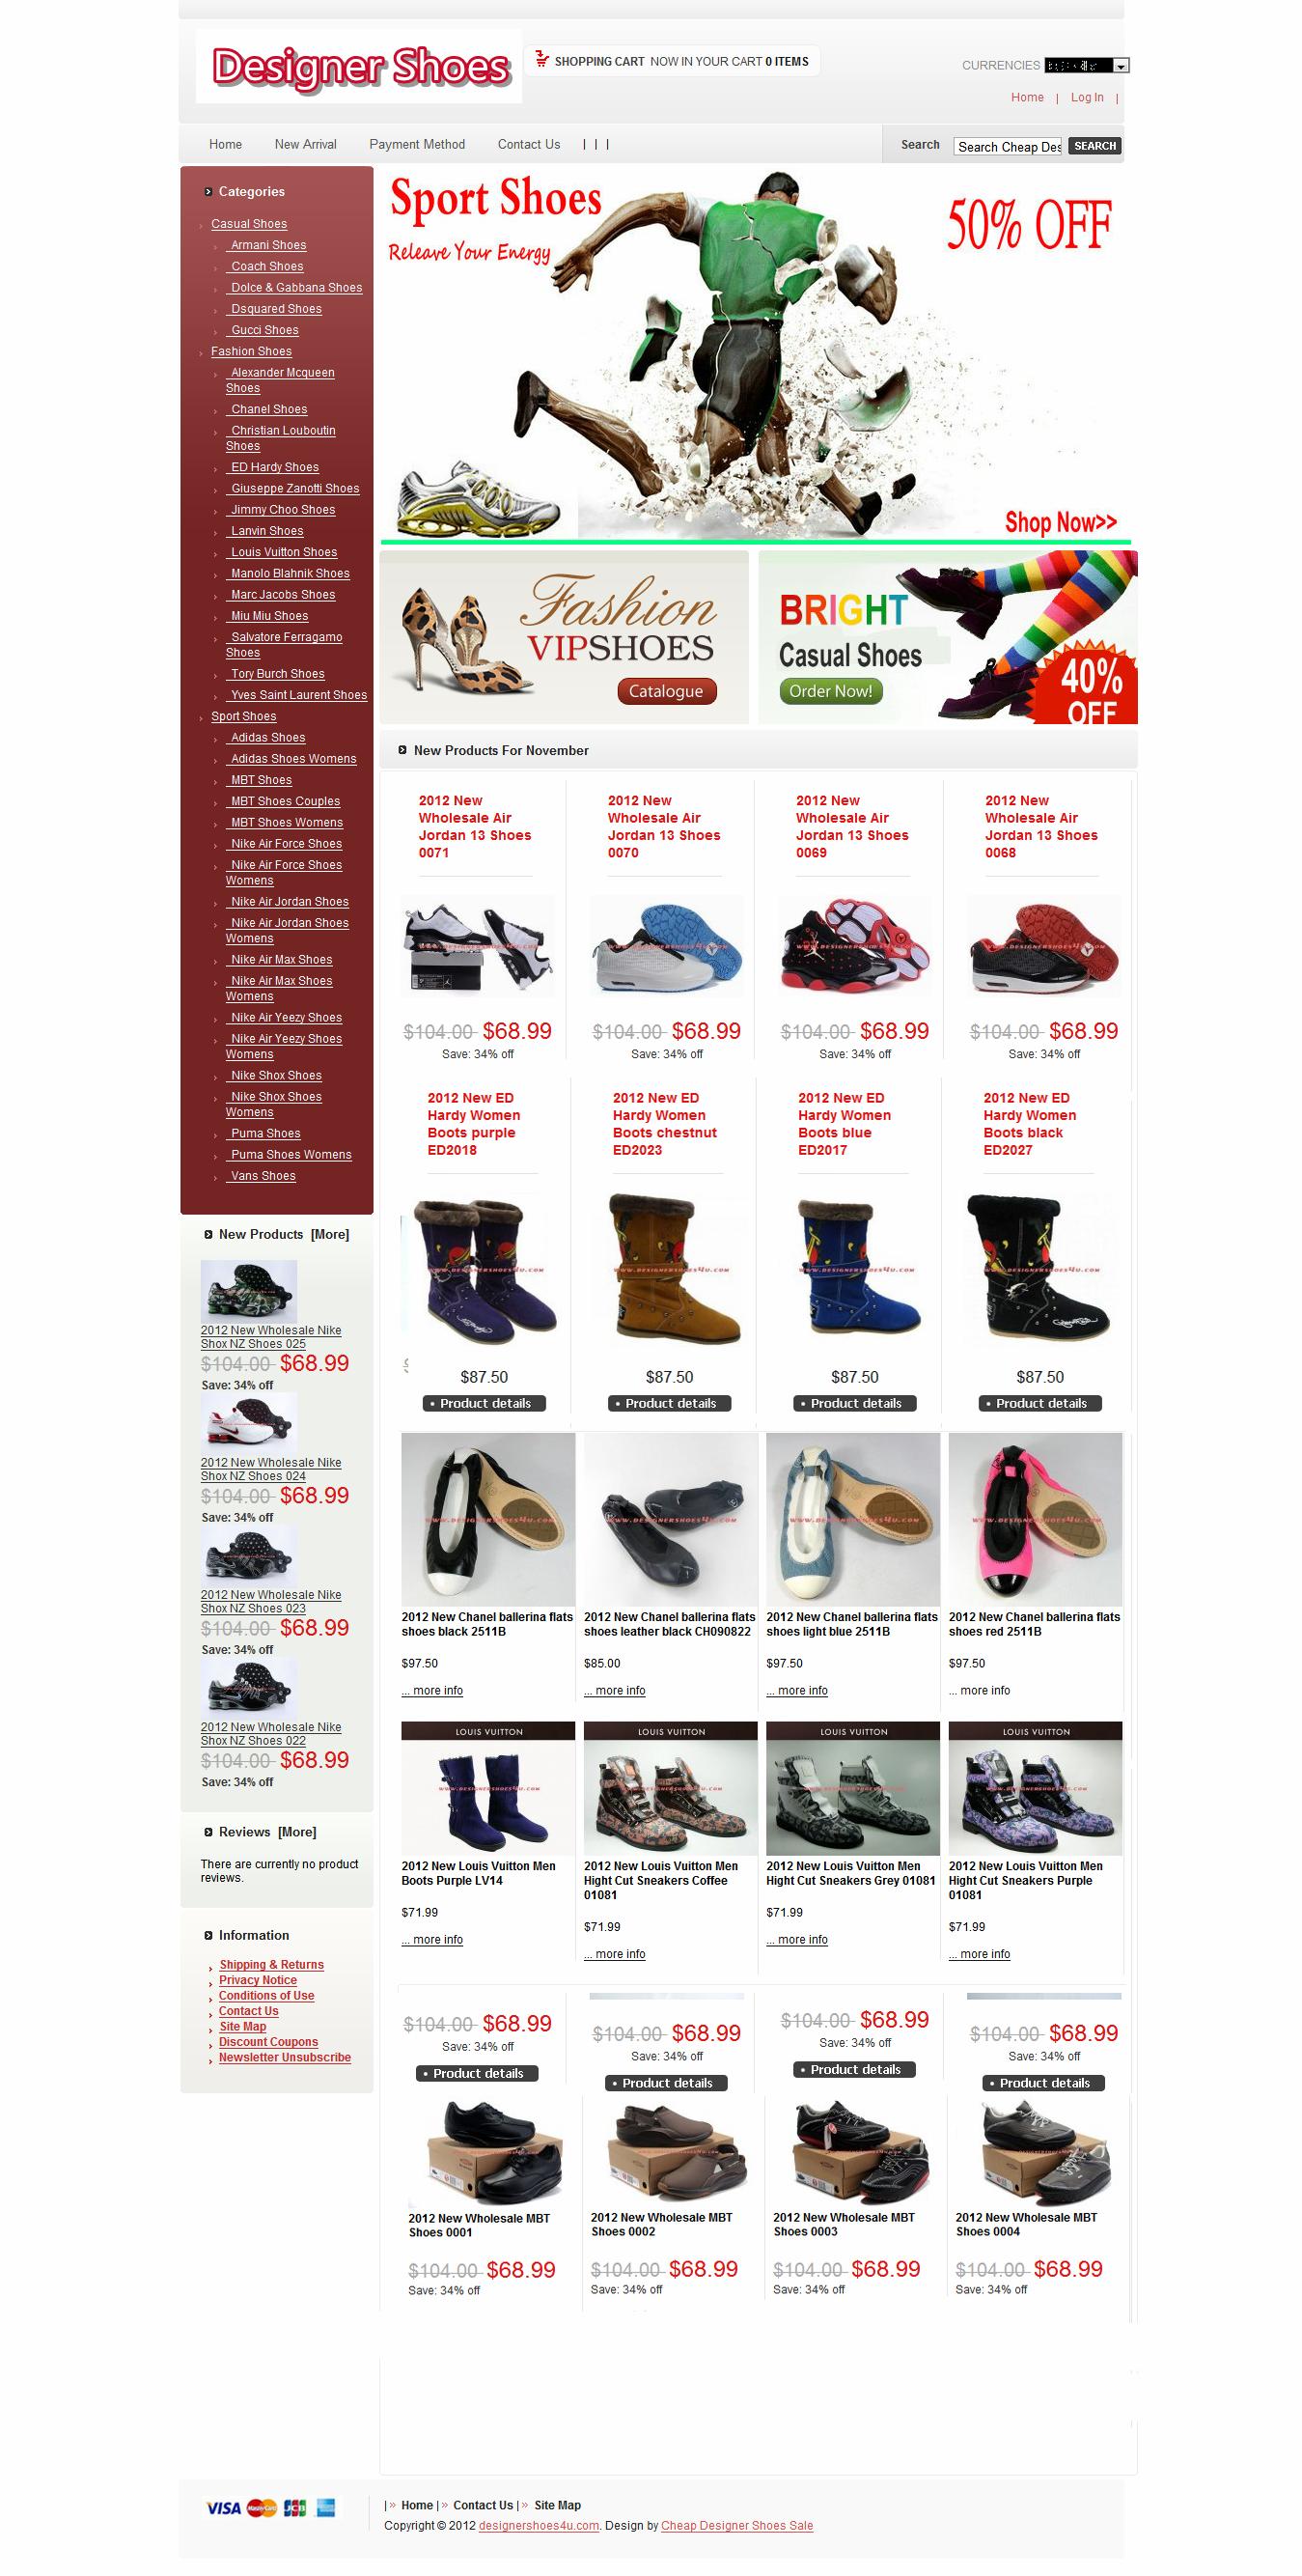 replica designer shoes for sale